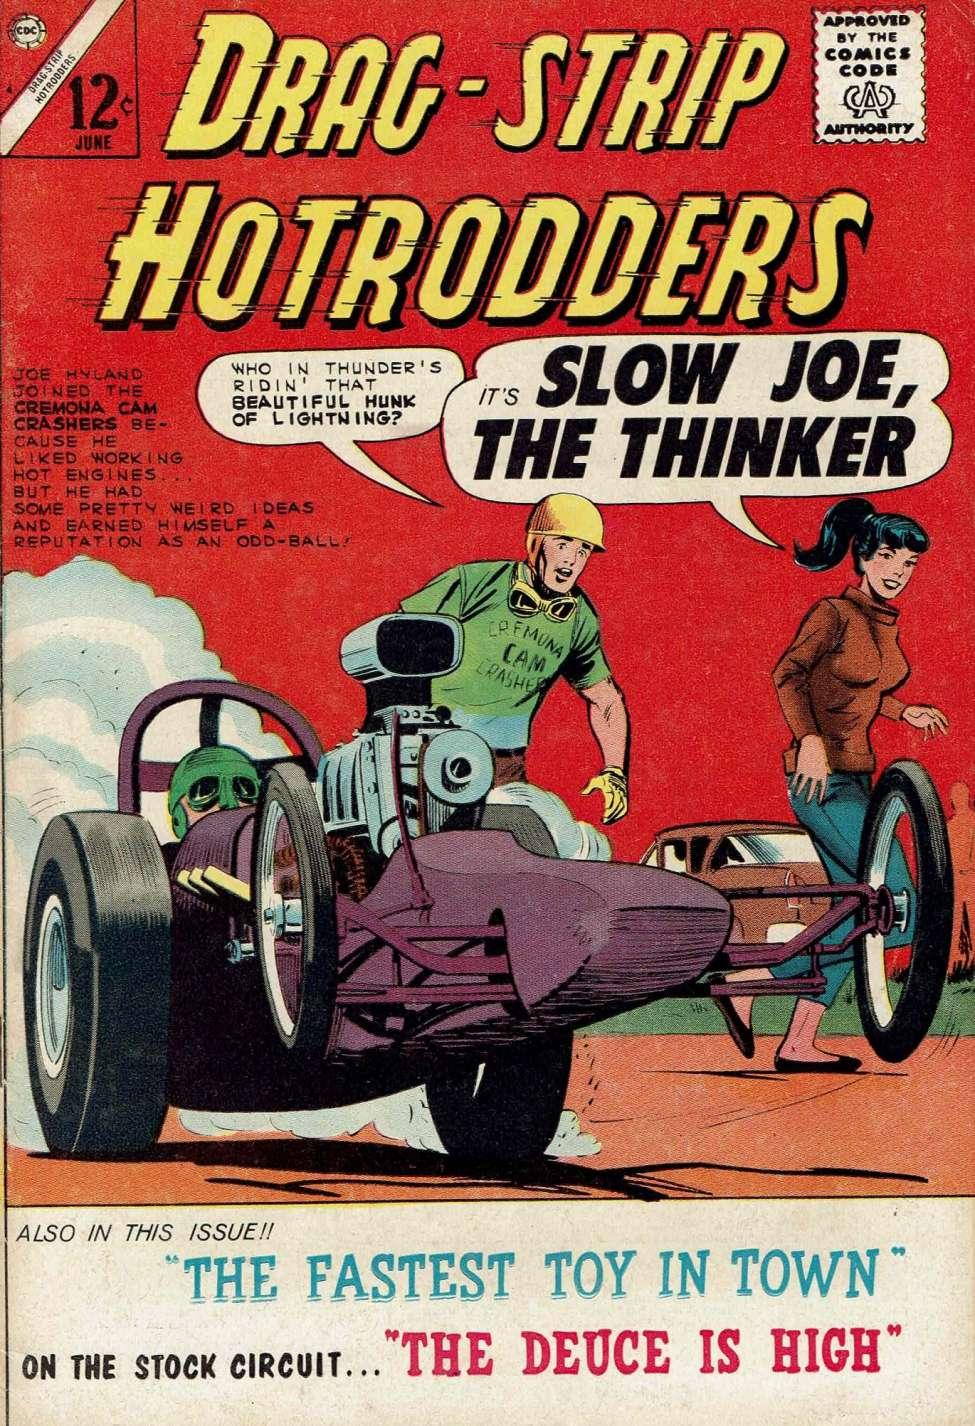 Drag-Strip Hotrodders #4 (Charlton) - Comic Book Plus